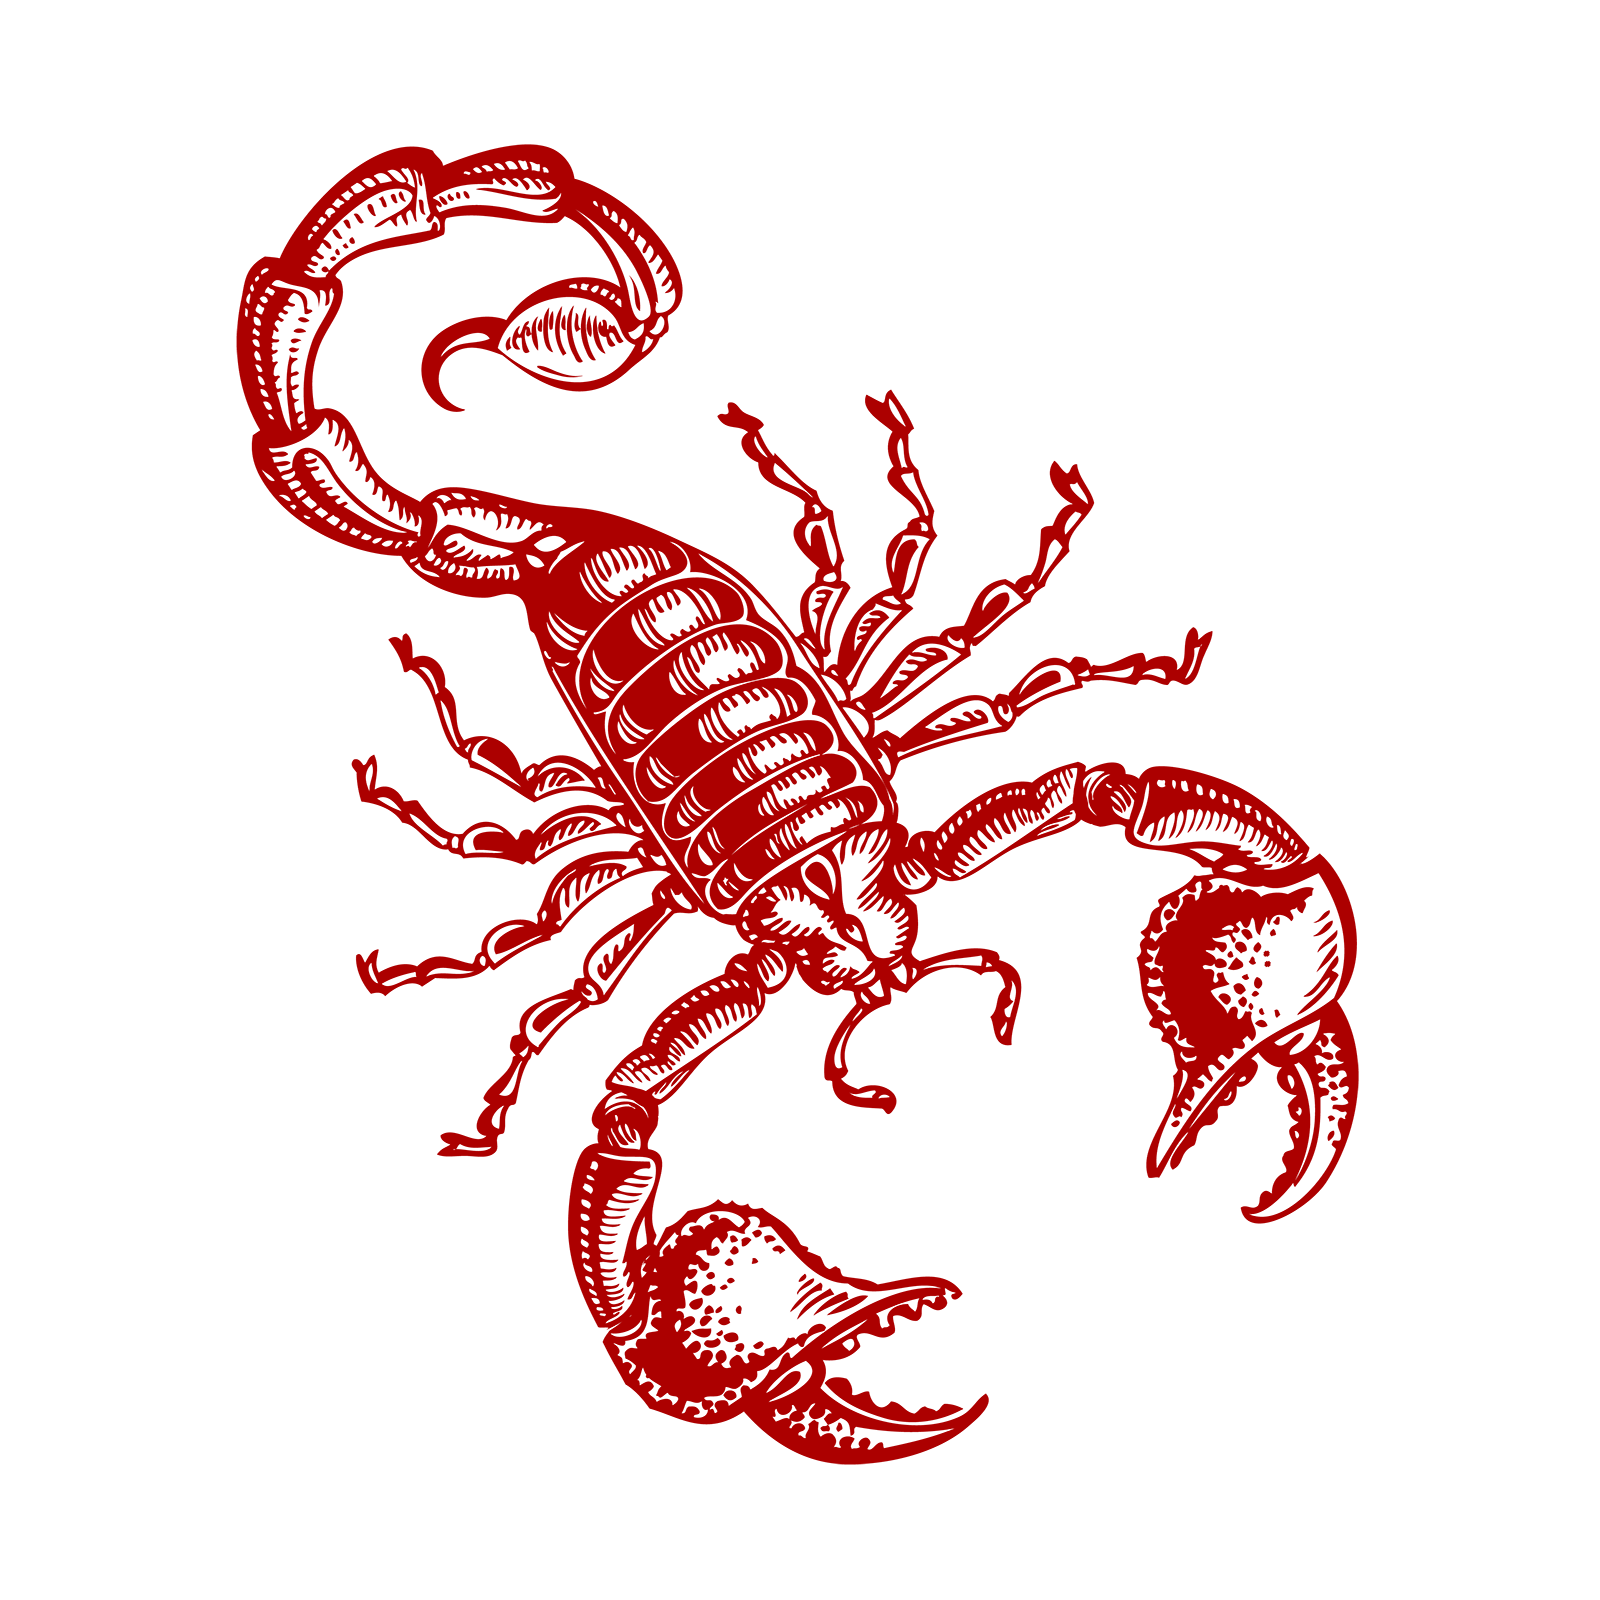 PSwDB Macbeth 2020 icon scorpion